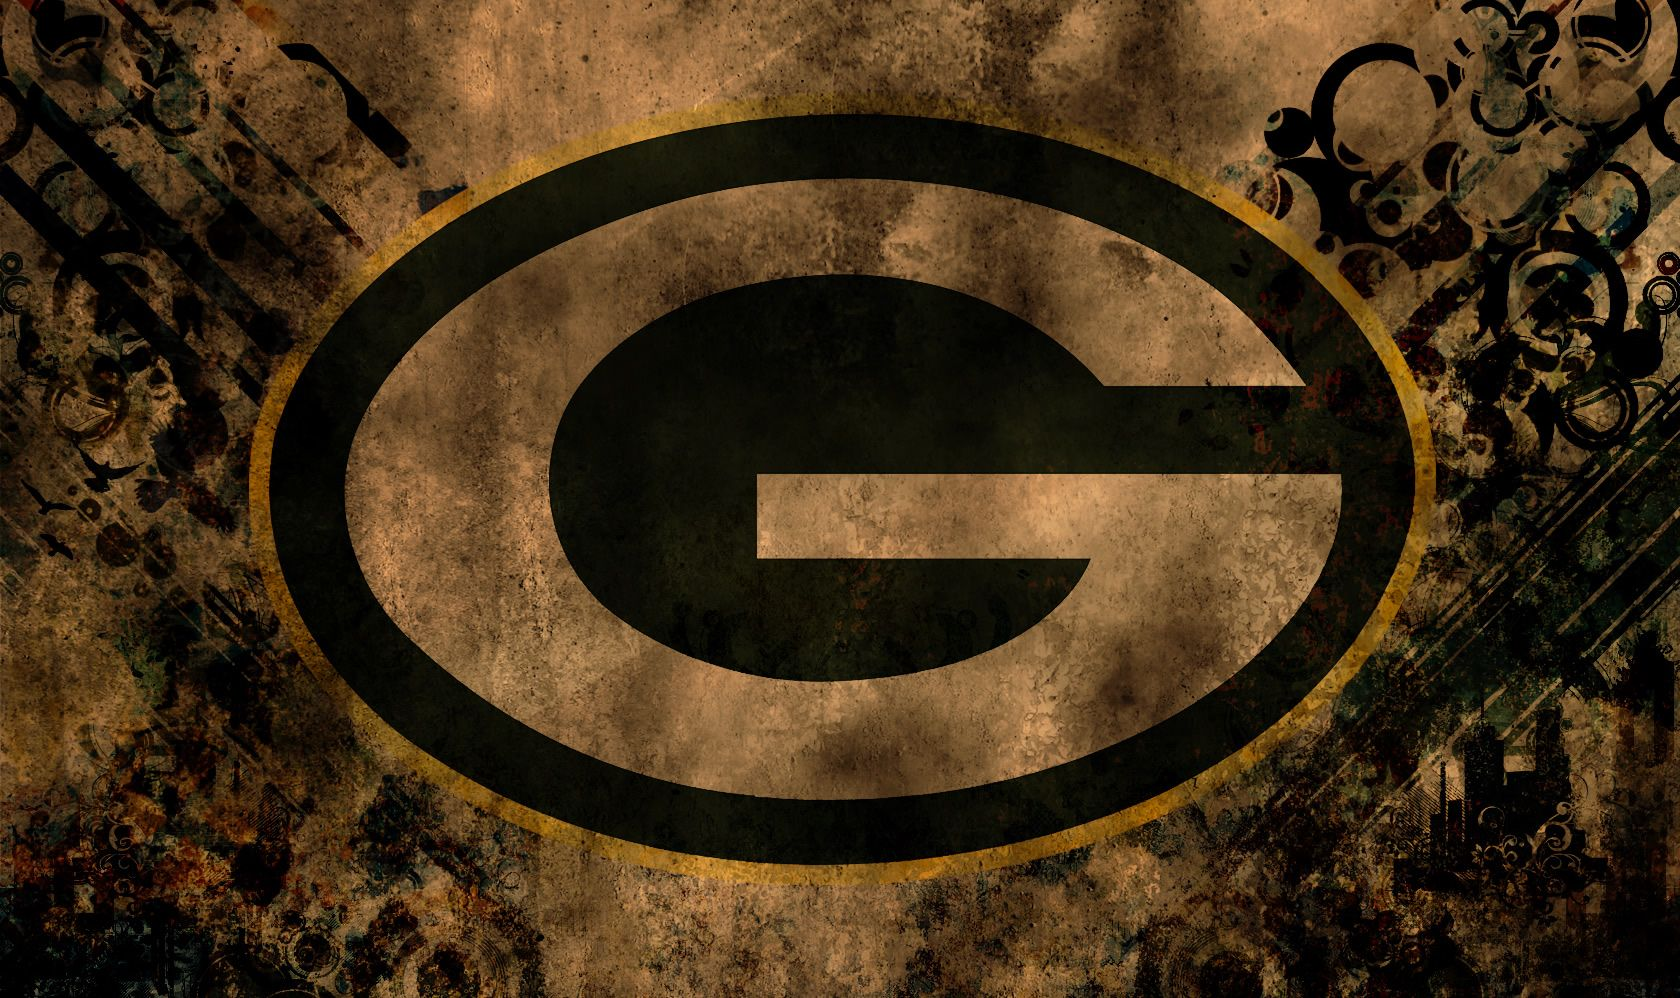 Green Bay Packers Wallpaper20 Jpg 1680 998 Green Bay Packers Wallpaper Green Bay Packers Green Bay